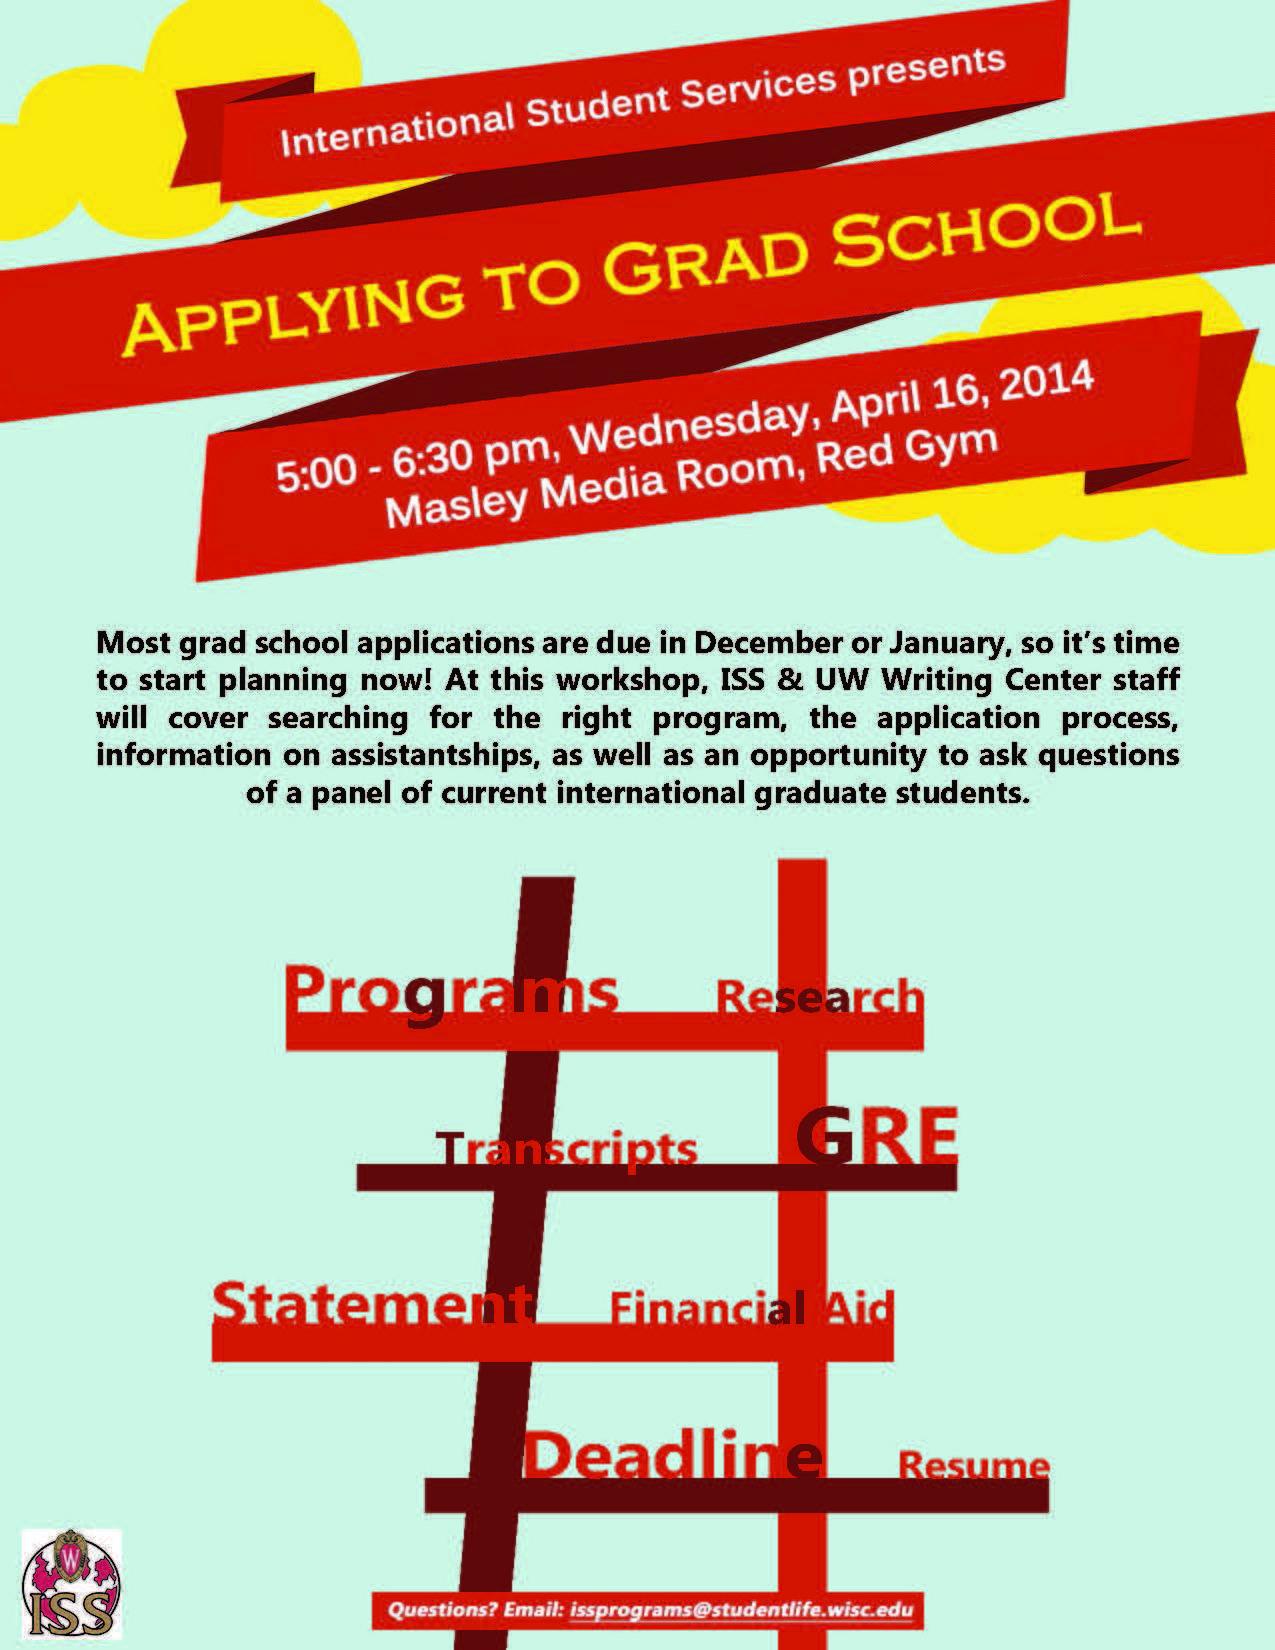 Apply To Grad School Workshop April 16 School Application Student Services Grad School